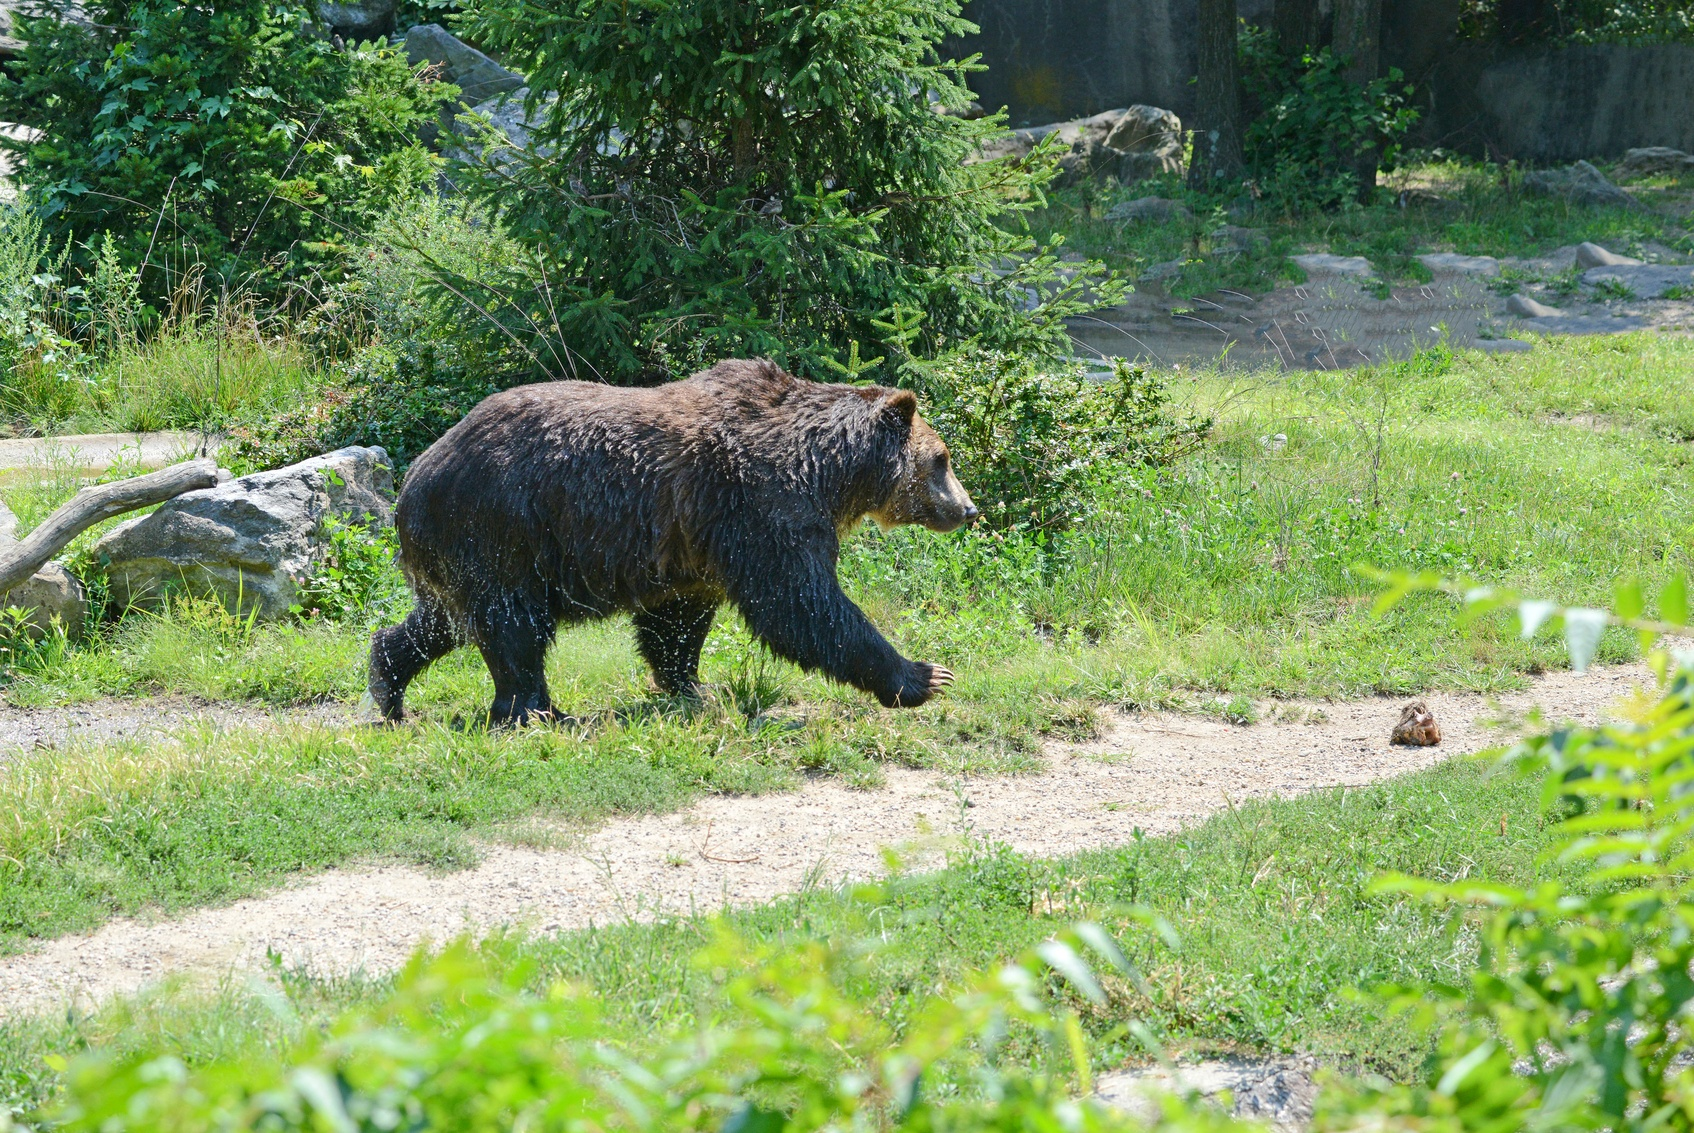 Be bear aware while hiking in Yellowstone